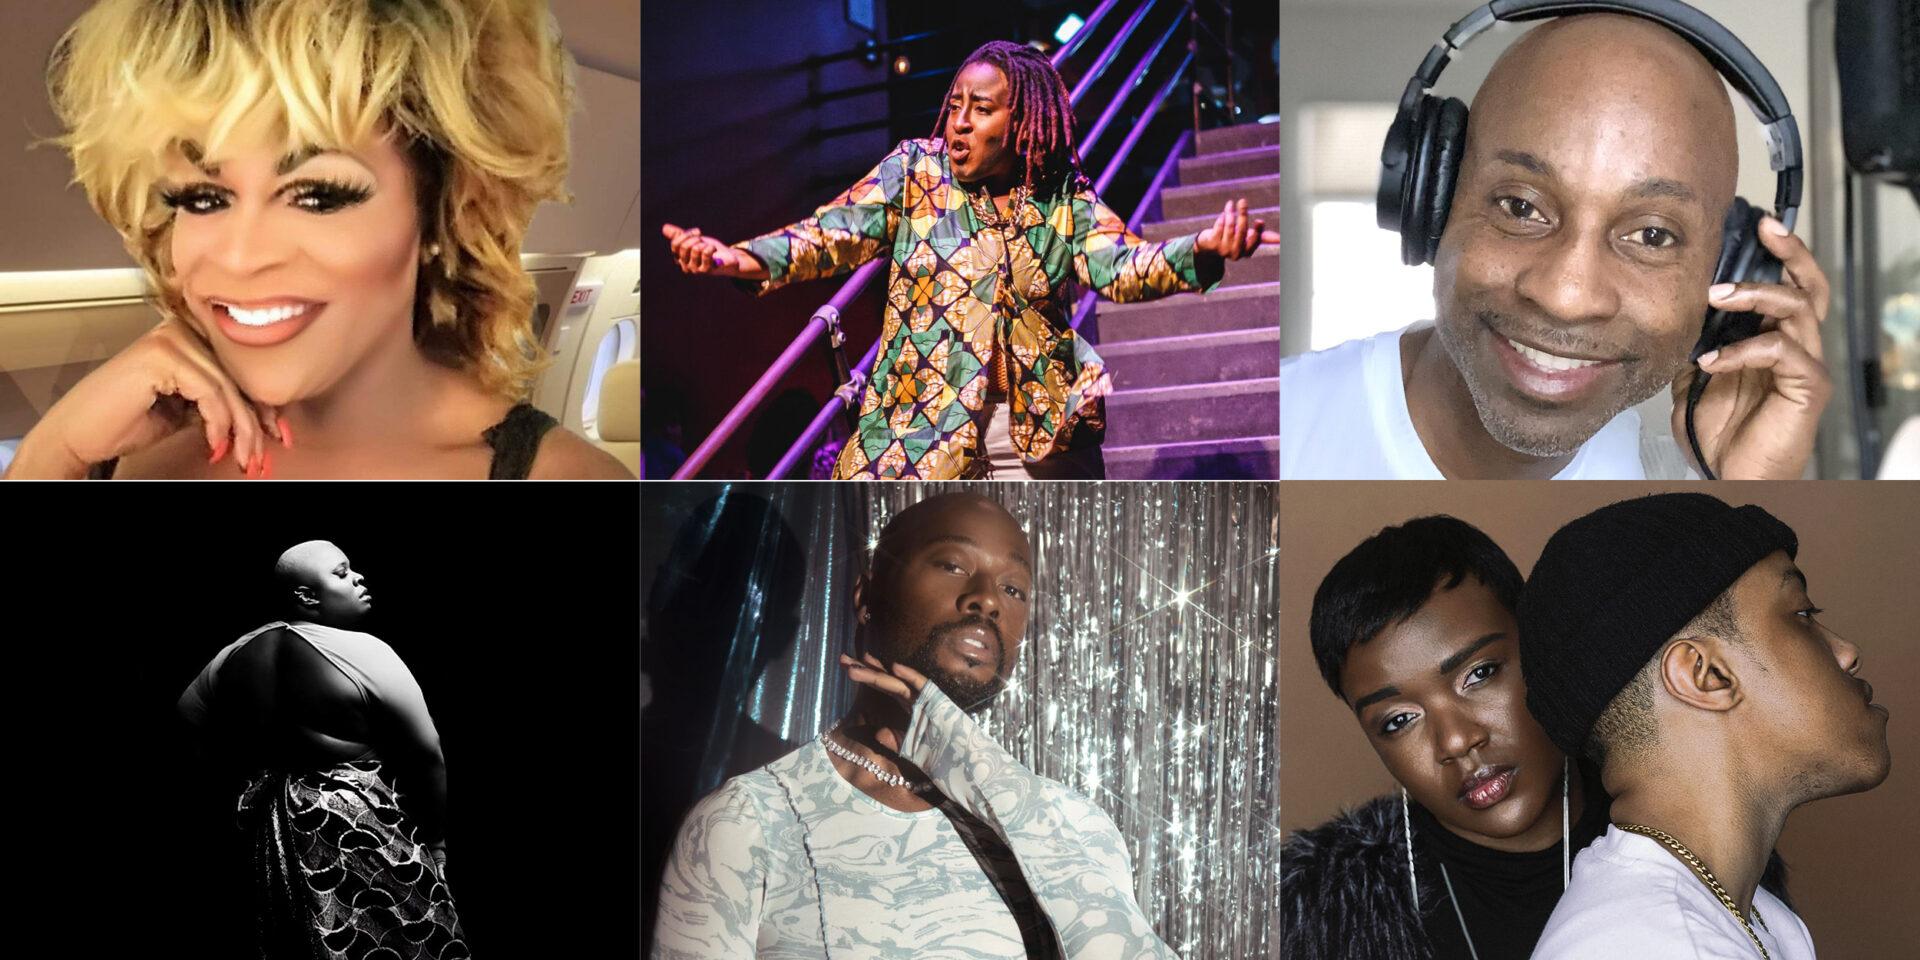 Top: Stephanie Stephens, Buster Highman, DJ Donovan, Bottom: Tika, Desirre, Trp.p